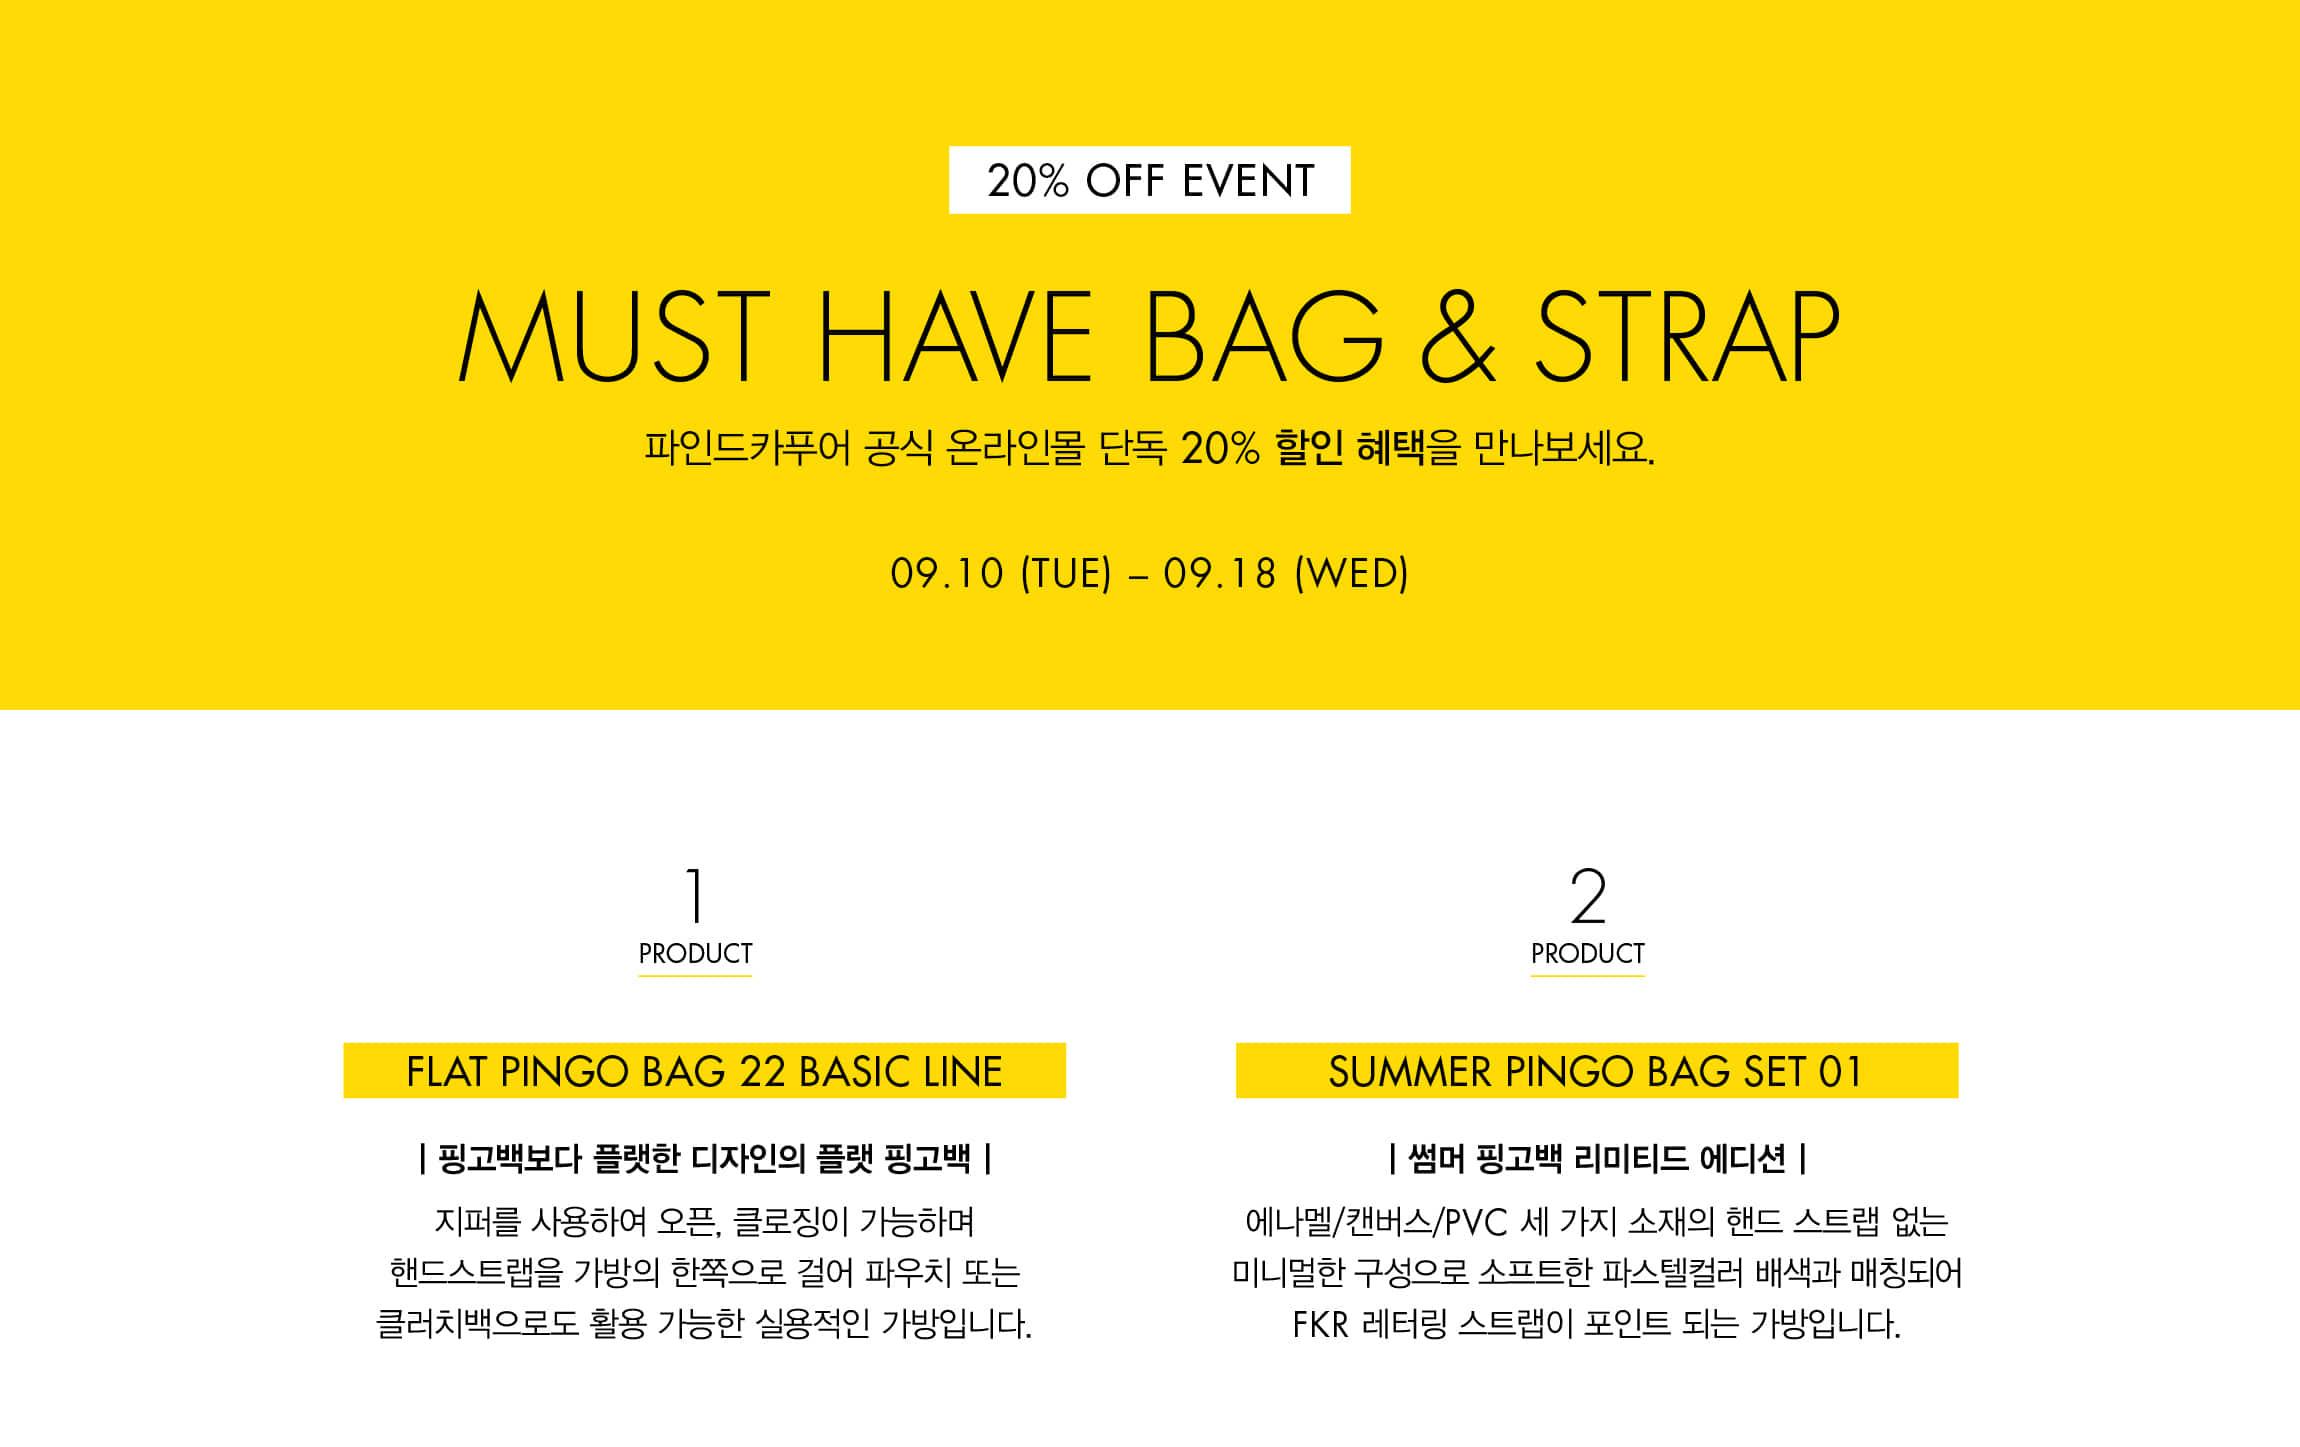 MUST HAVE BAG & STRAP